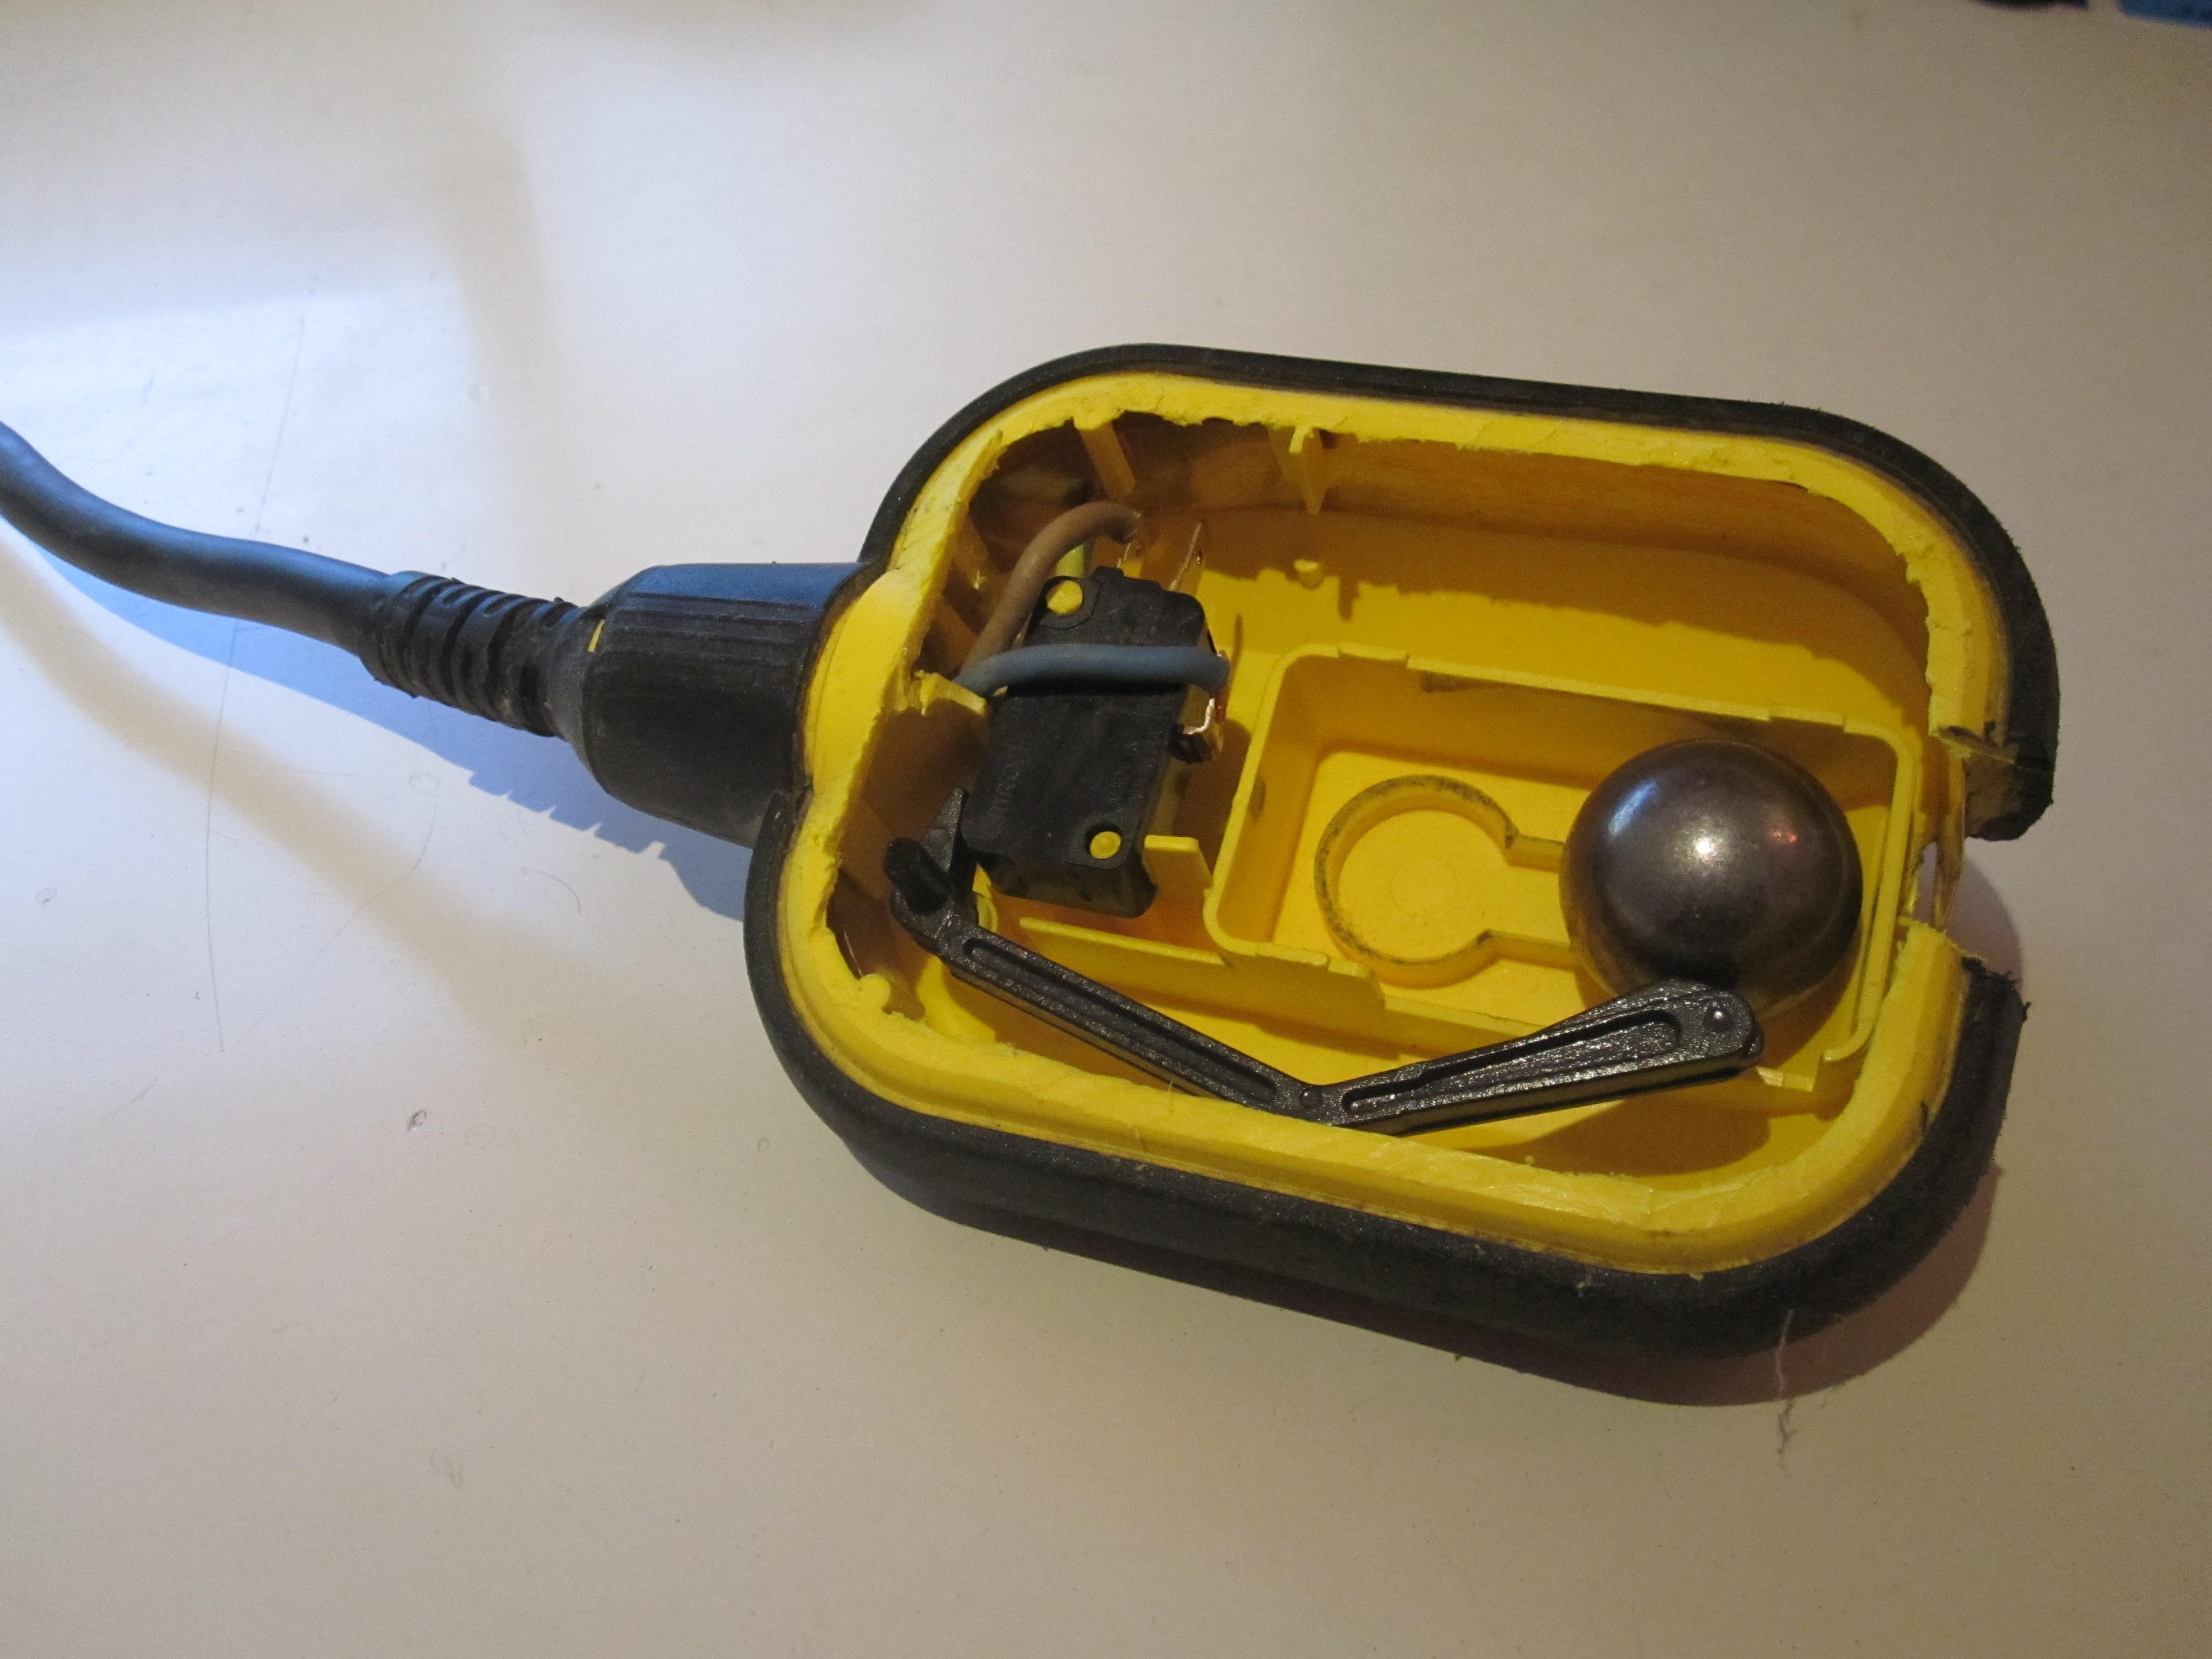 float level switch wiring diagram breaker box file off jpg wikimedia commons